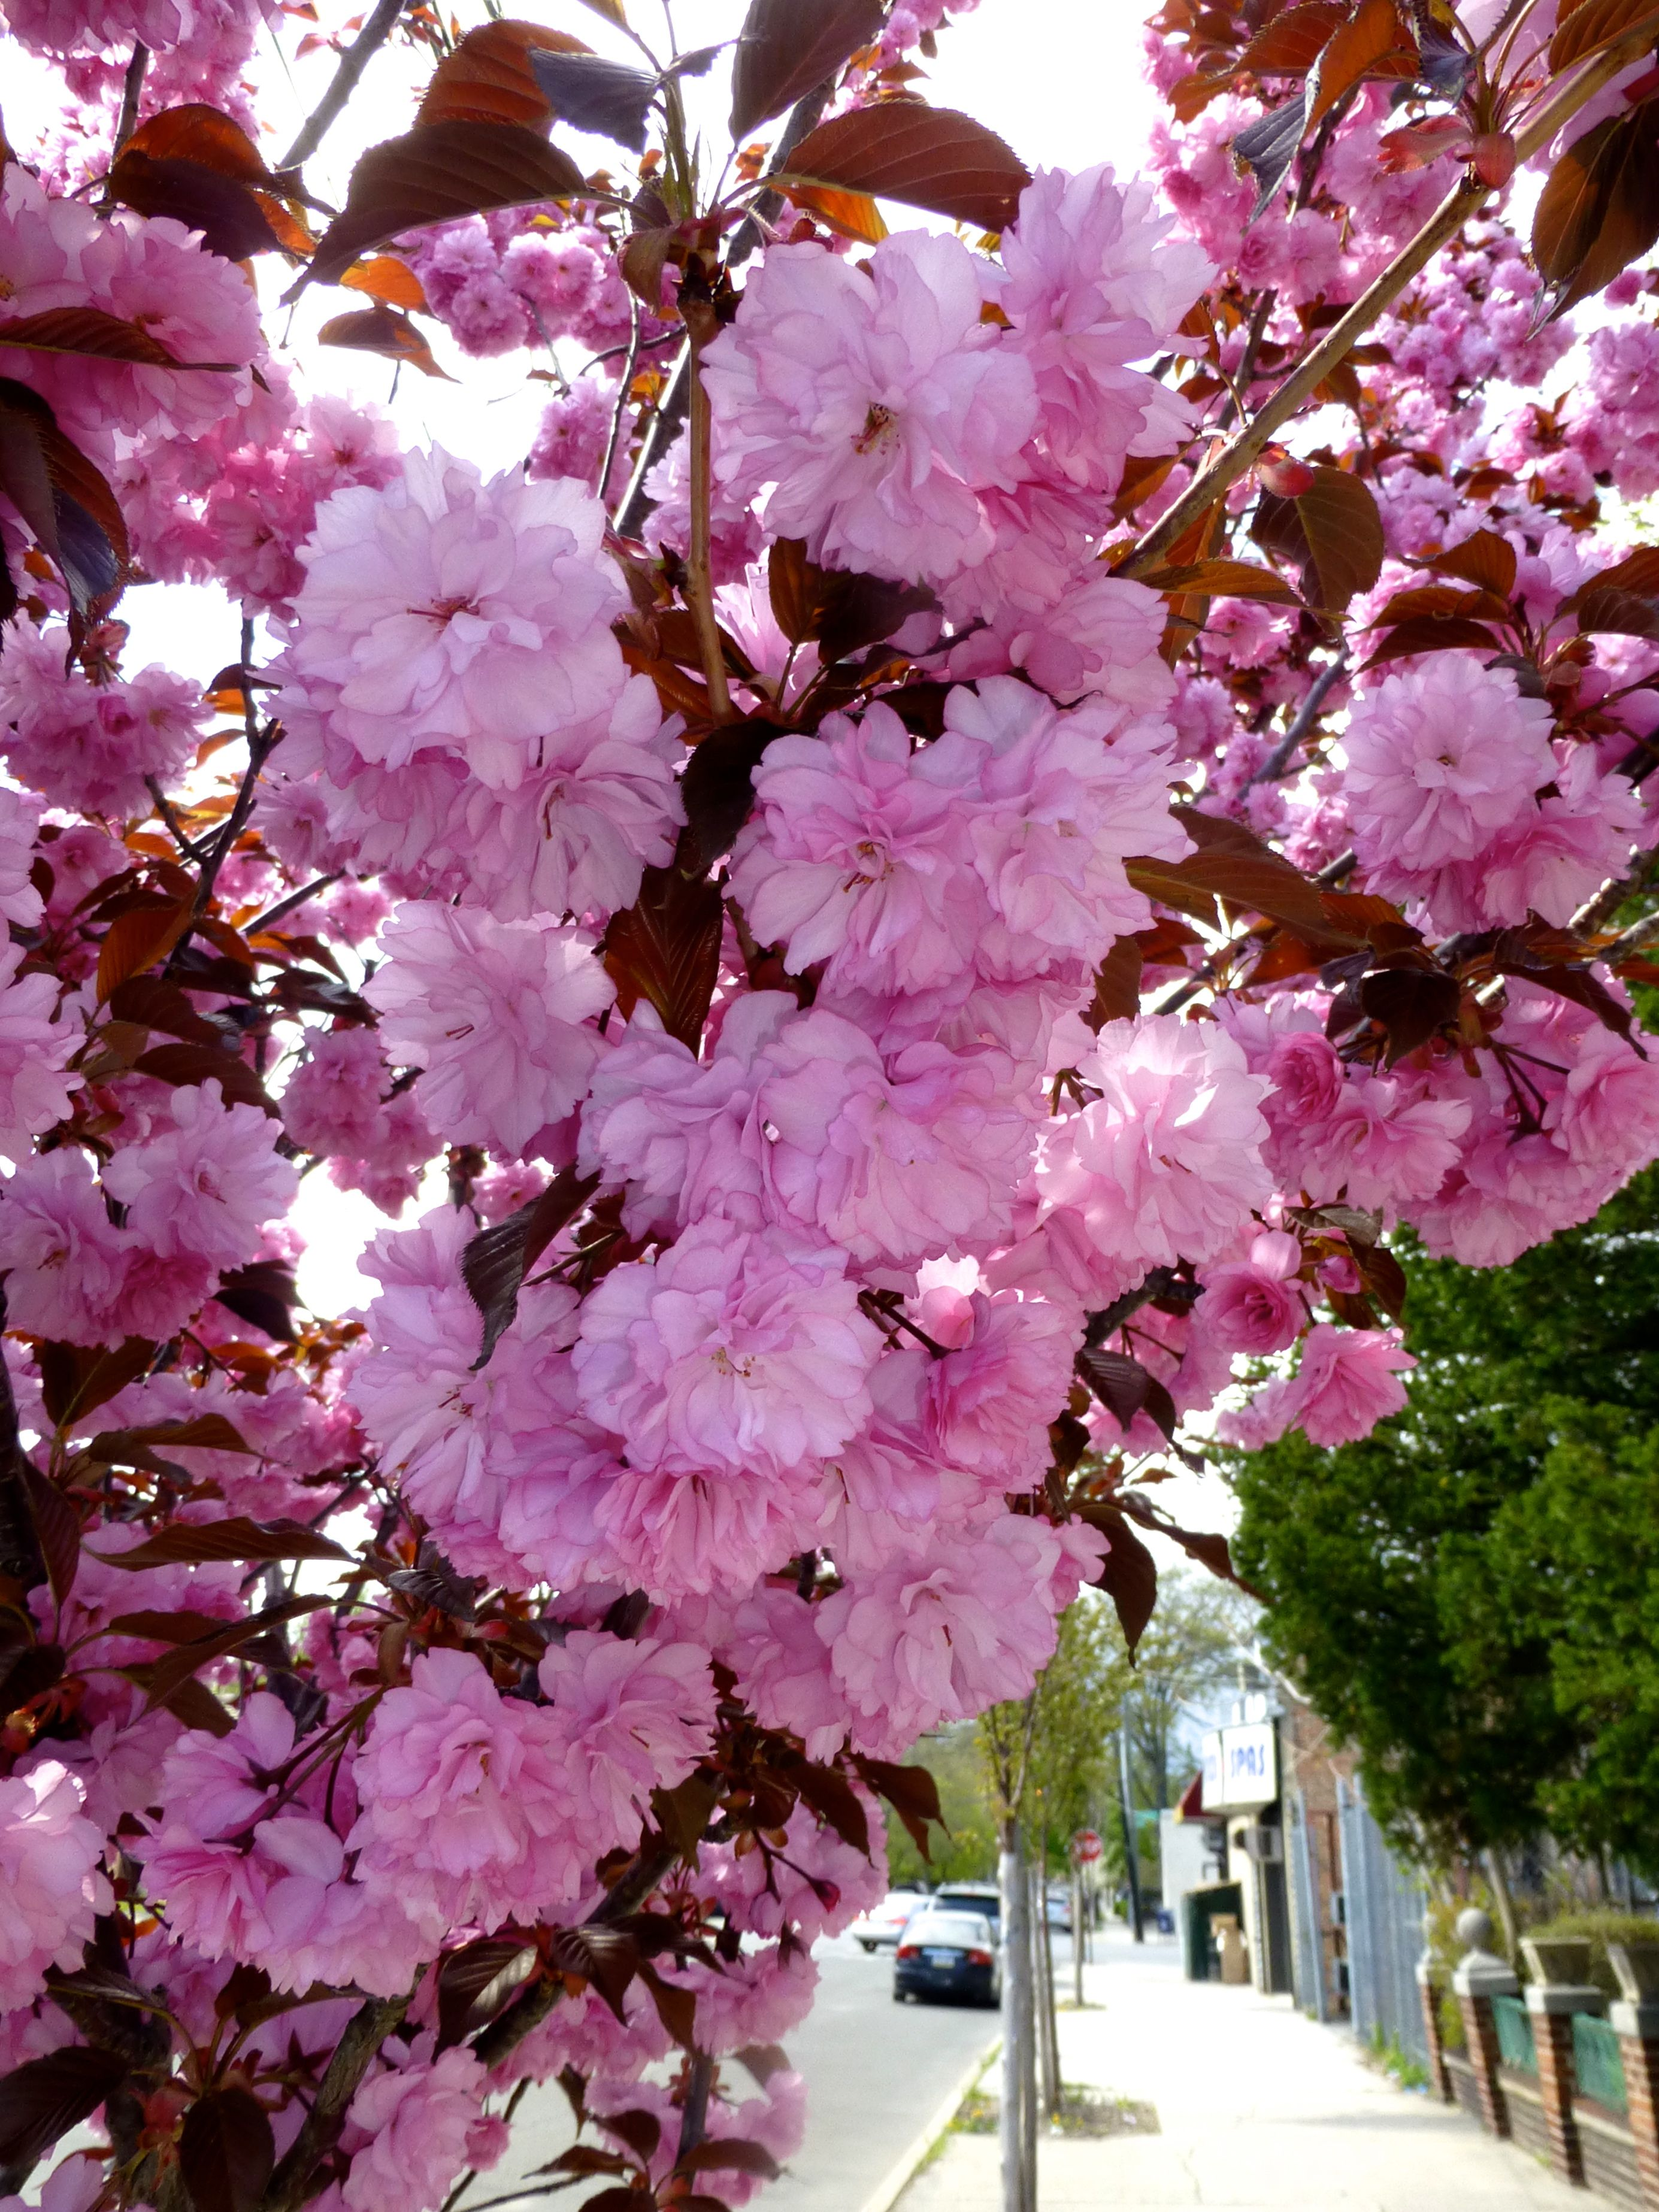 Pin By Carmela Romano On My Photos Sakura Tree Plants Garden Plants